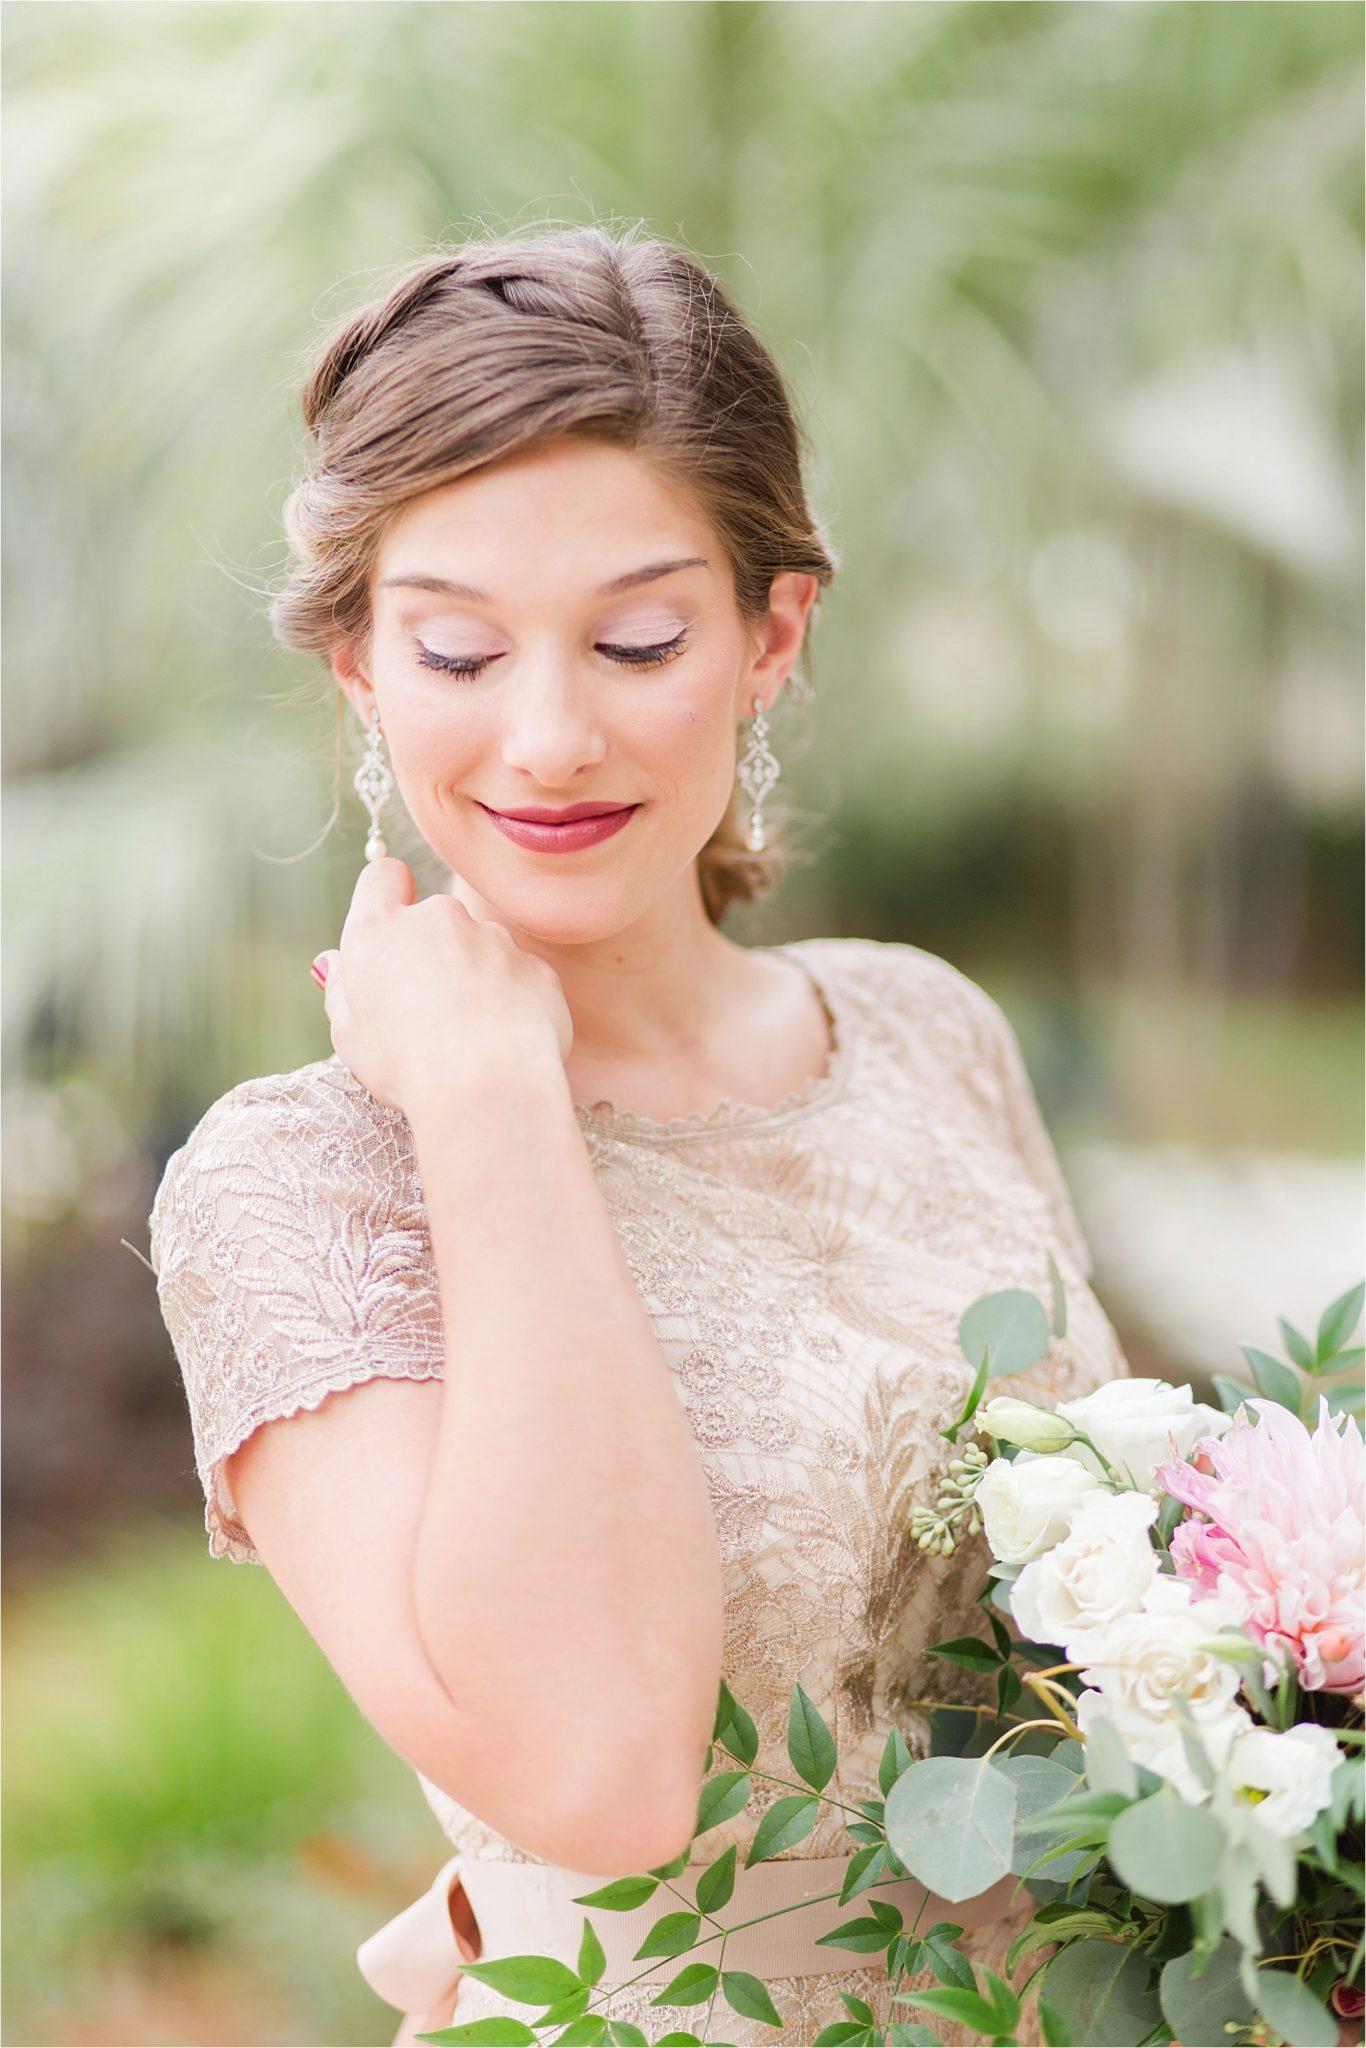 maid of honor-dress-earrings-gold ornate dress-wedding day